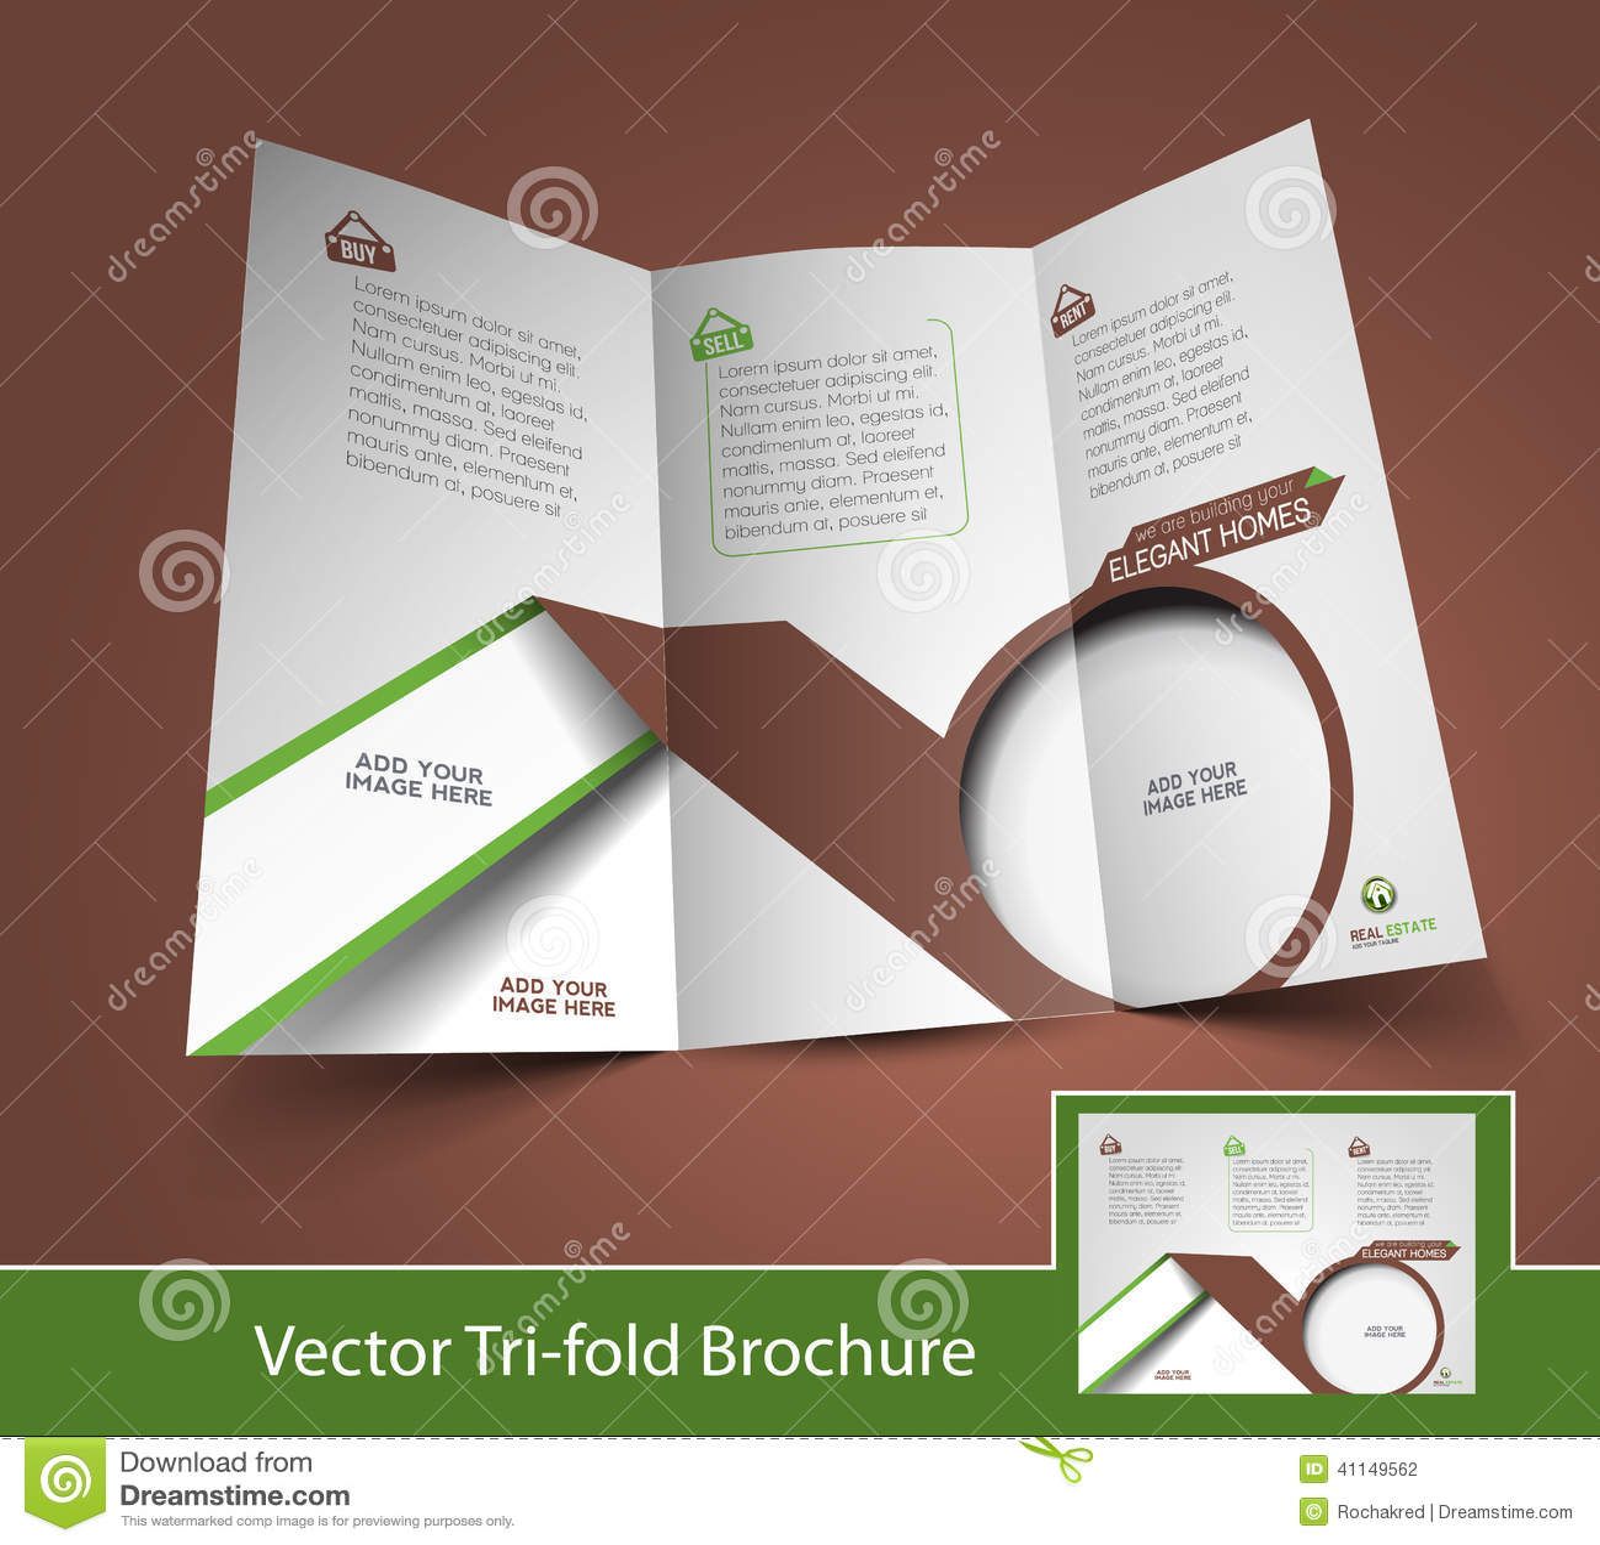 real estate tri fold brochure template - real estate tri fold brochure stock vector image 41149562